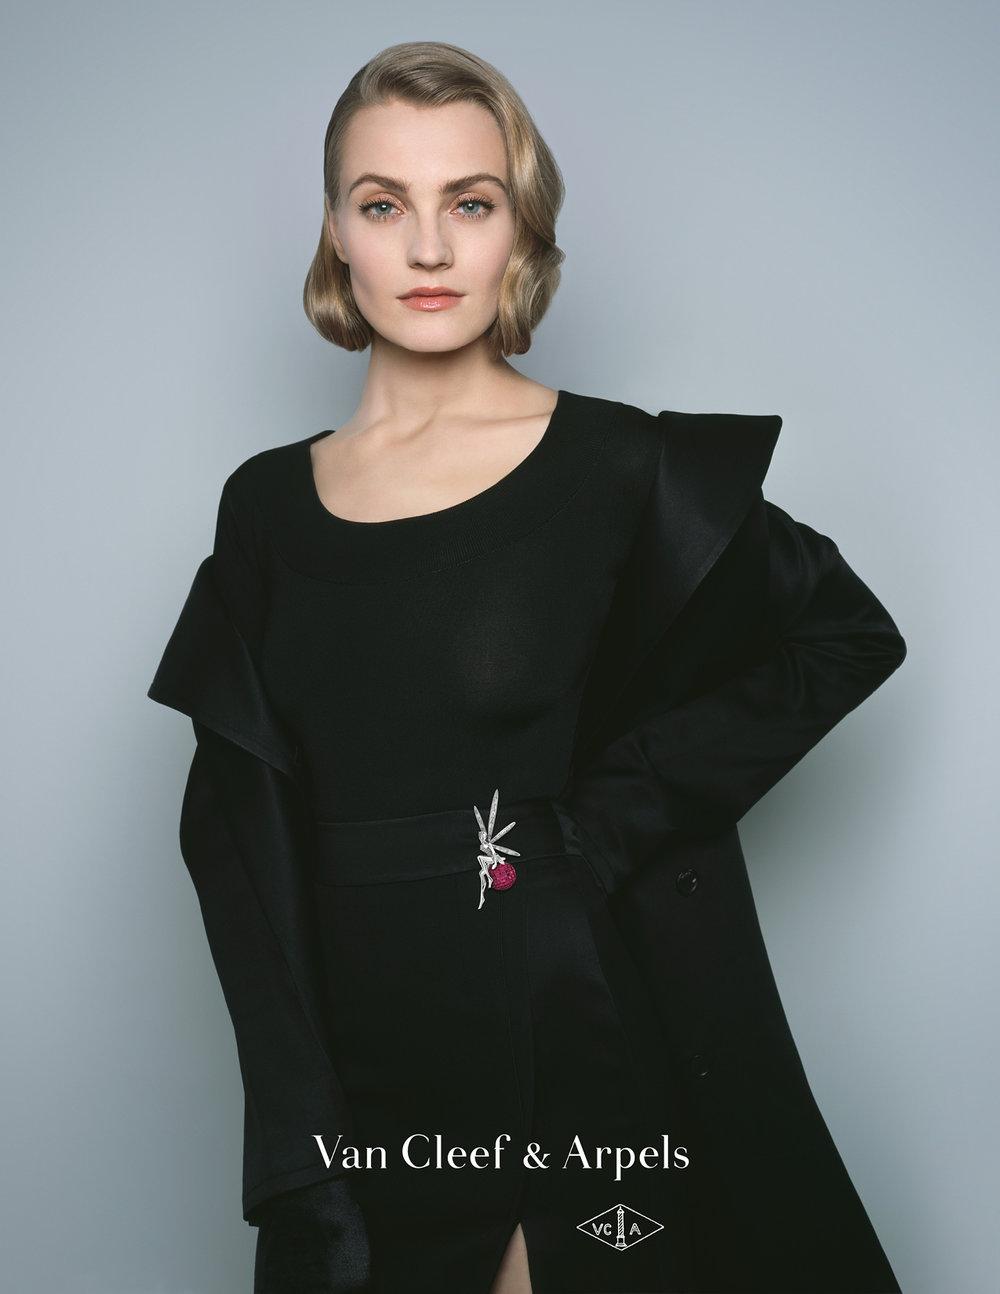 #vancleefarpels #fw17 #campaign #jewelry #brigitteniedermair #carineroitfeld #annajagodzinska #jimkaemmerling #oliverschawalder #topolino